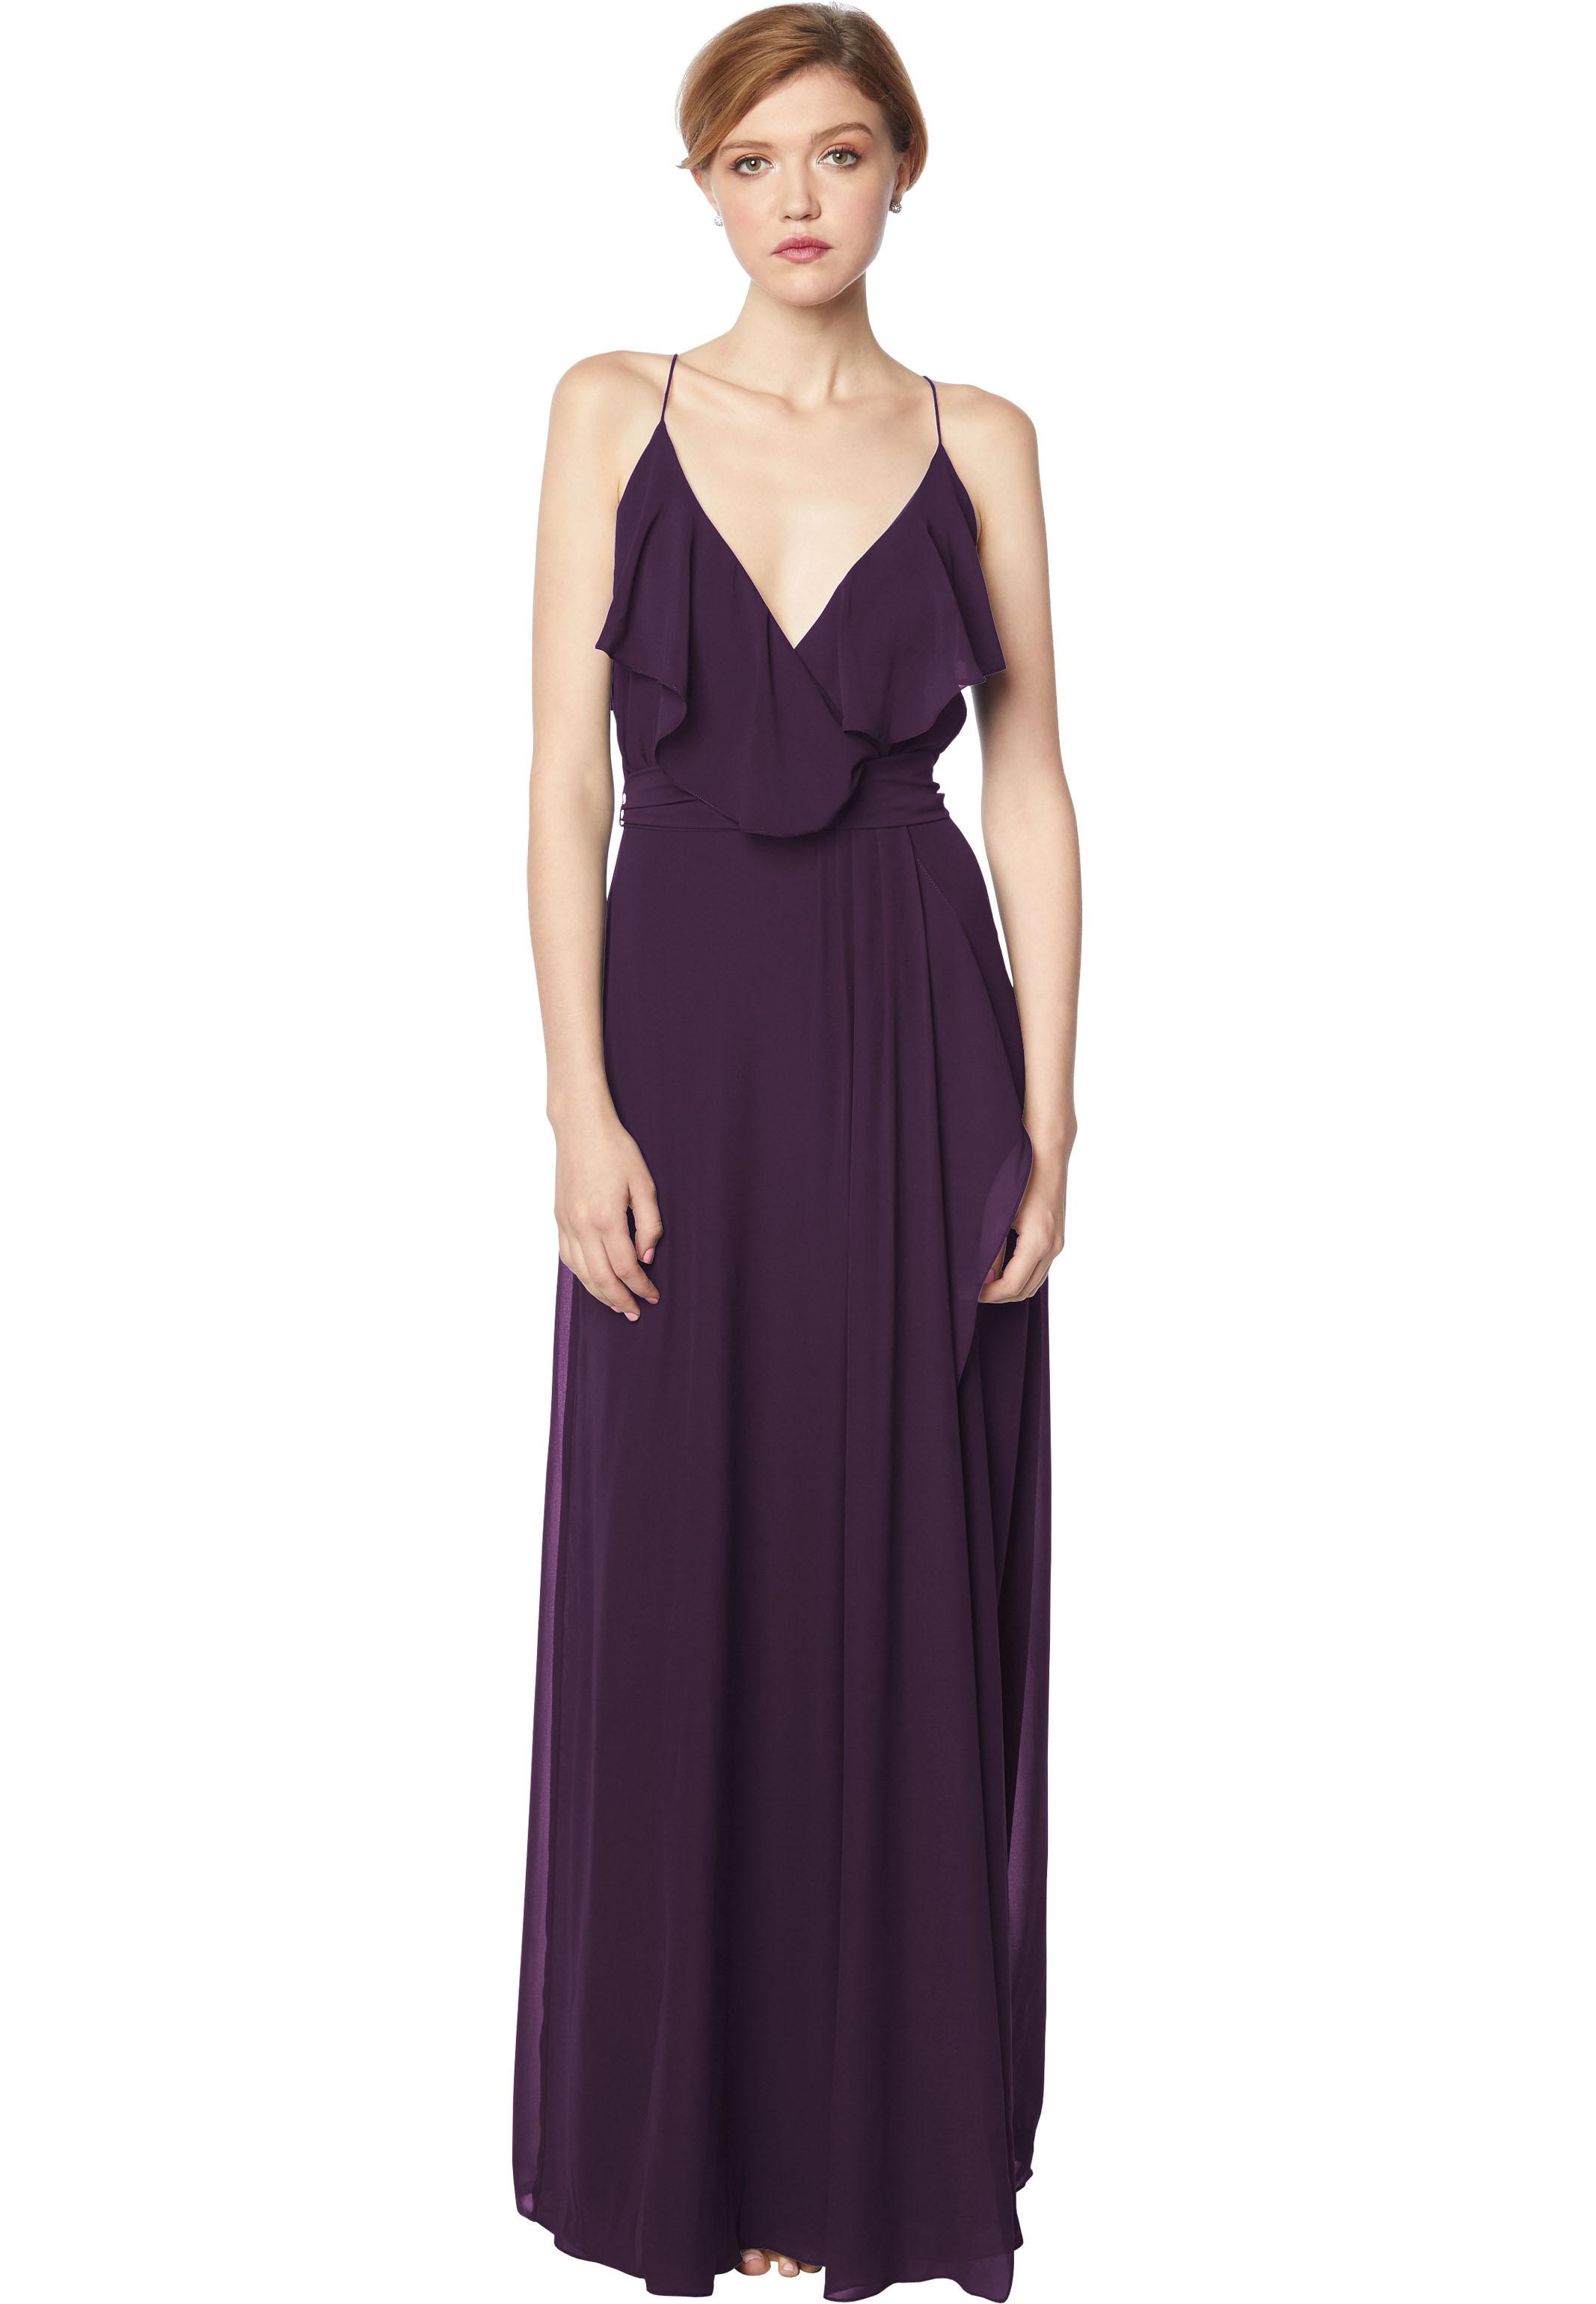 Bill Levkoff PLUM Chiffon V-neck A-line gown, $176.00 Front